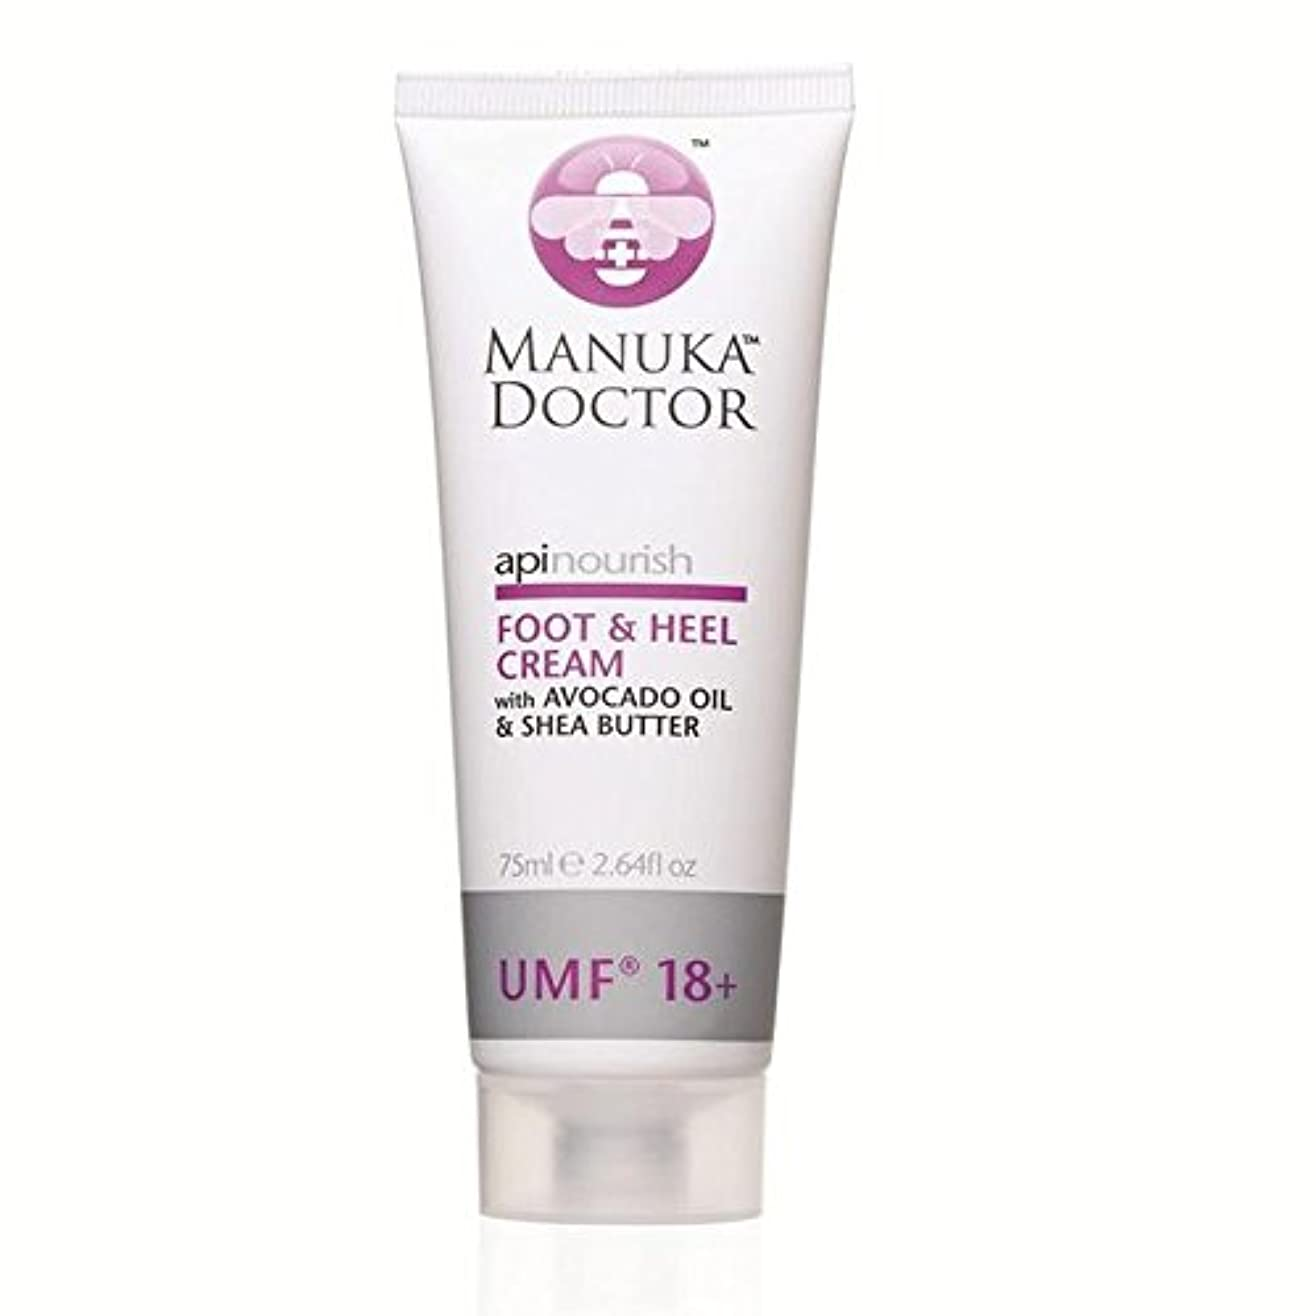 Manuka Doctor Api Nourish Foot & Heel Cream 75ml - マヌカドクター足&かかとクリーム75ミリリットルを養います [並行輸入品]